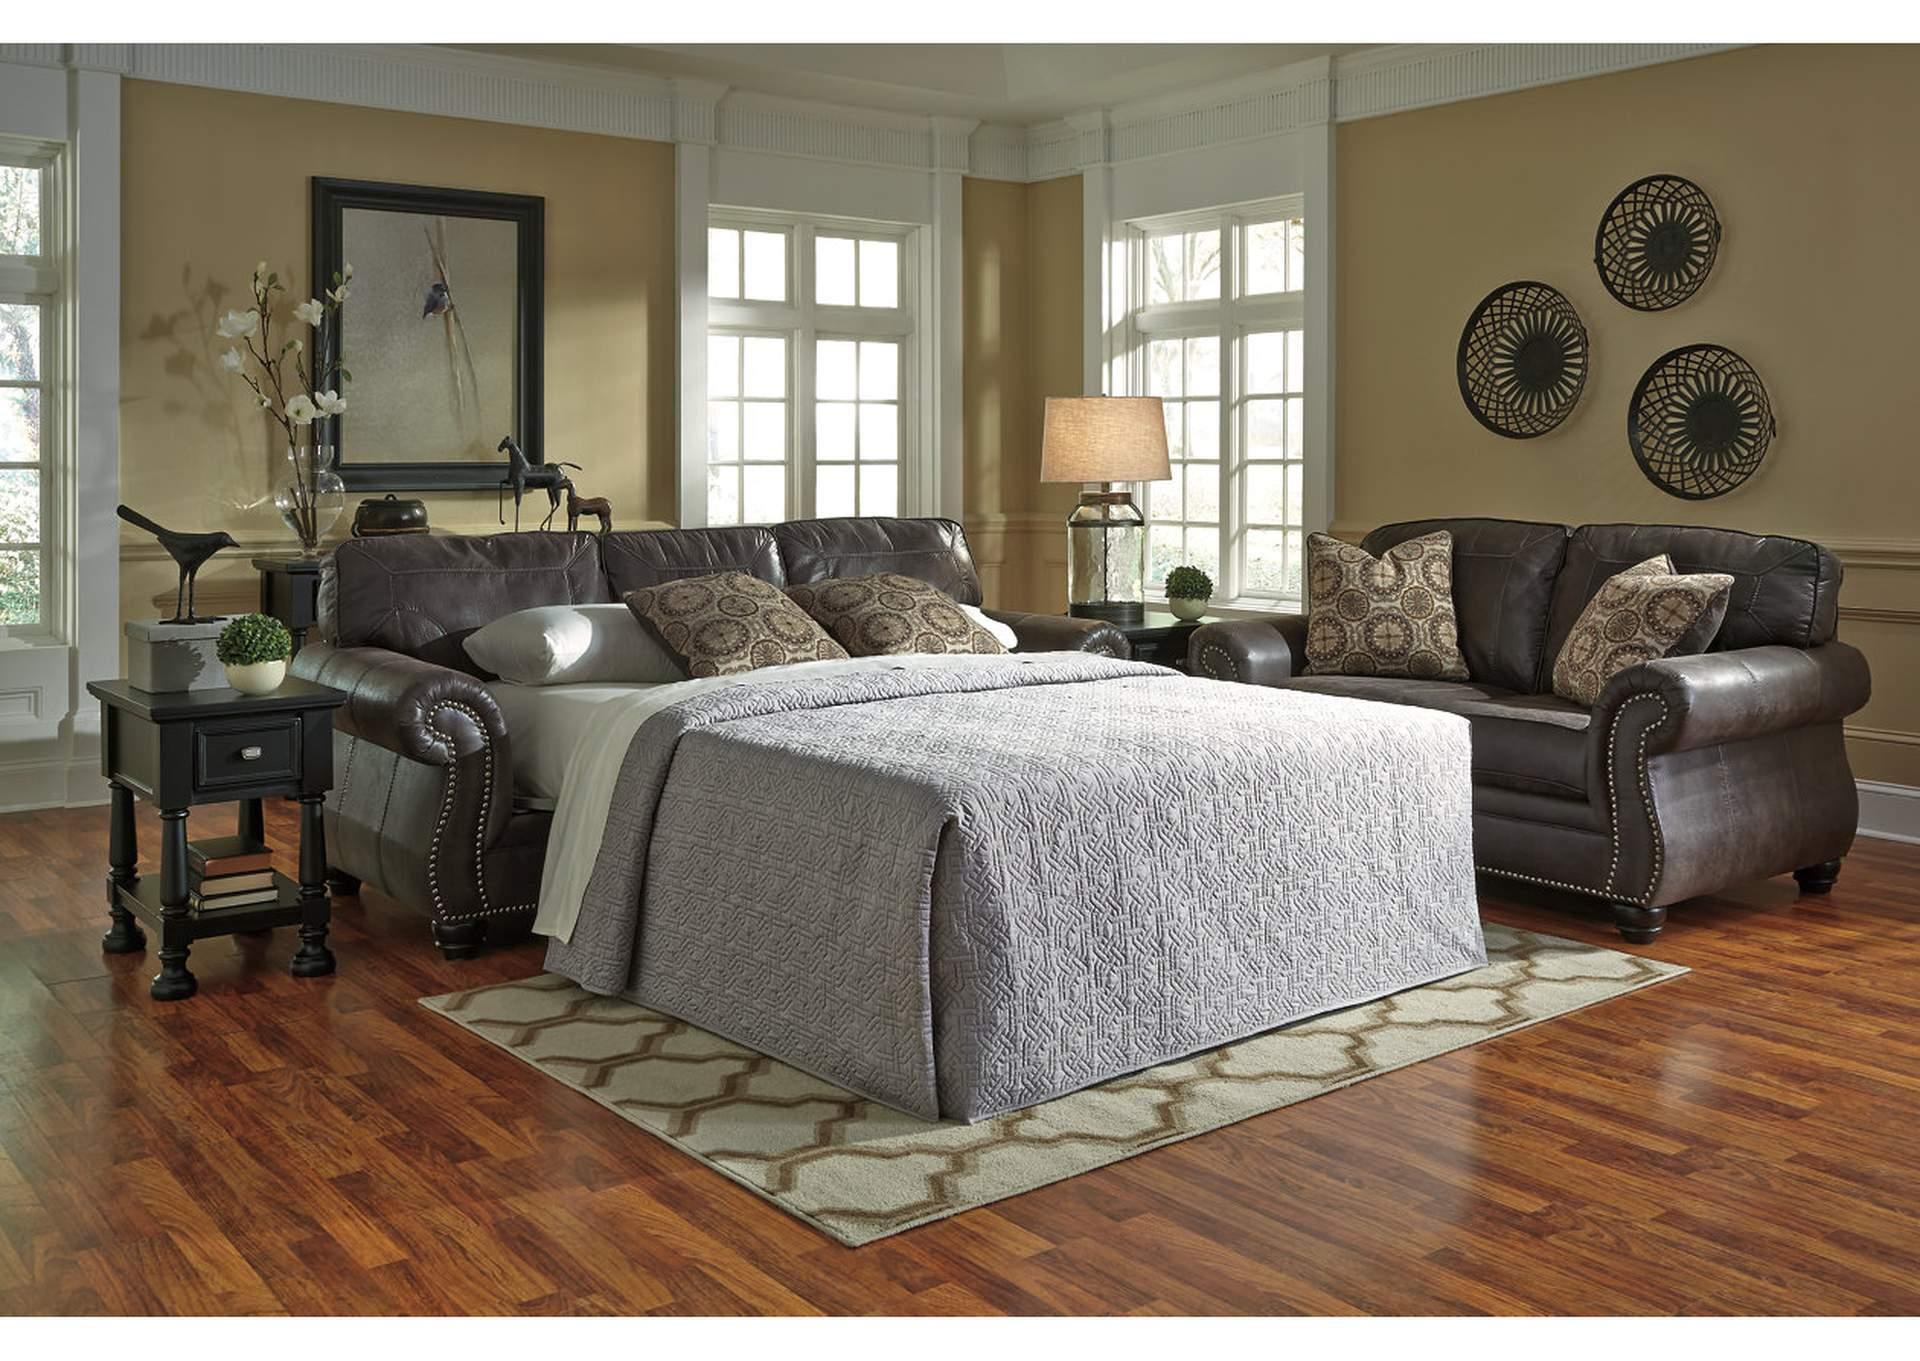 Stupendous Austins Couch Potatoes Furniture Stores Austin Texas Beatyapartments Chair Design Images Beatyapartmentscom